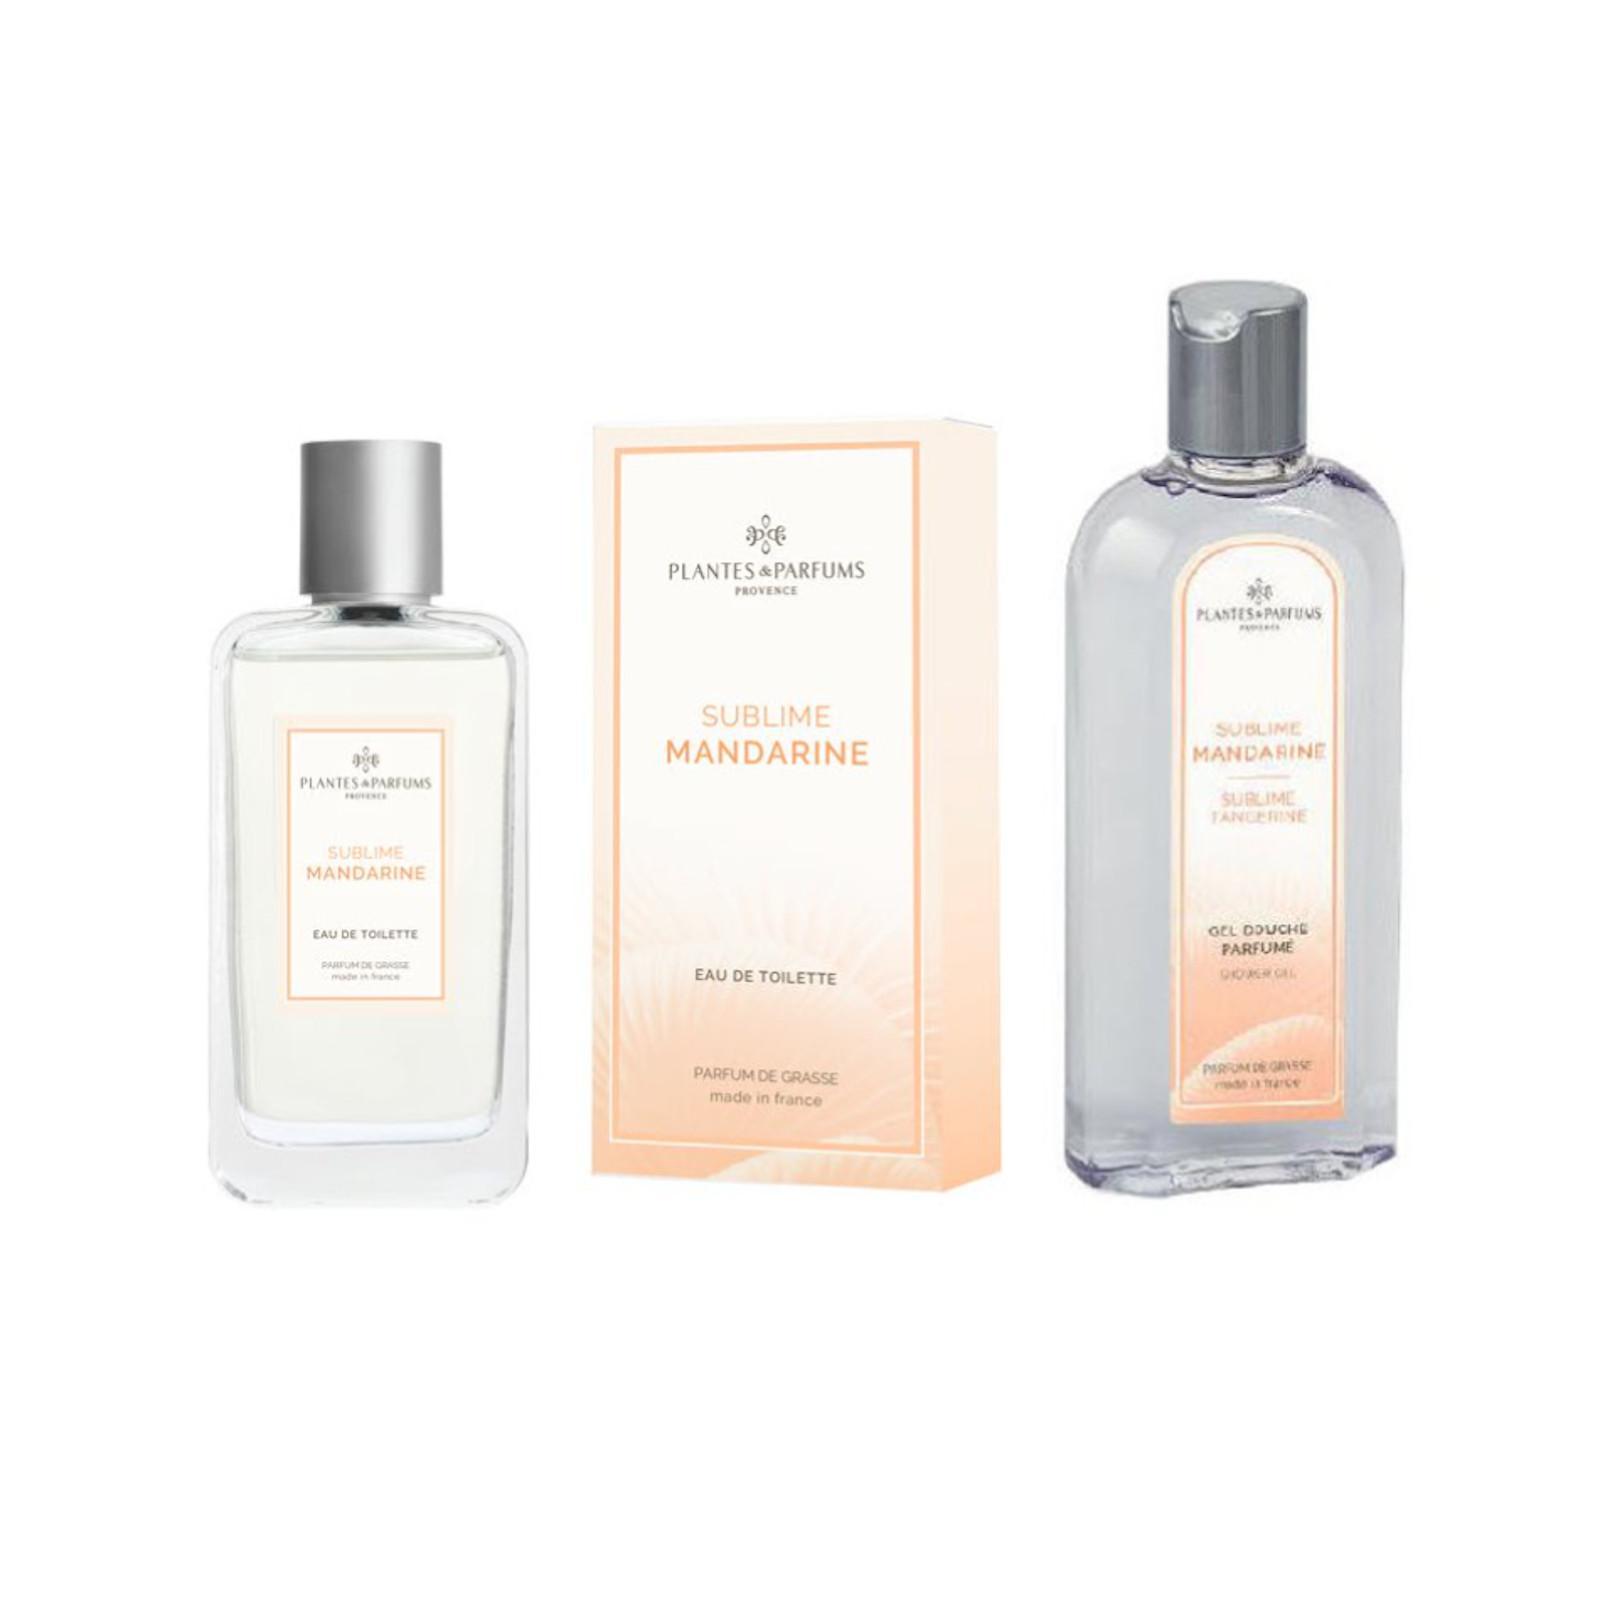 Plantes et Parfums Dámská Toaletní Voda a Sprchový Gel Sublime Mandarine 100 ml + 250 ml